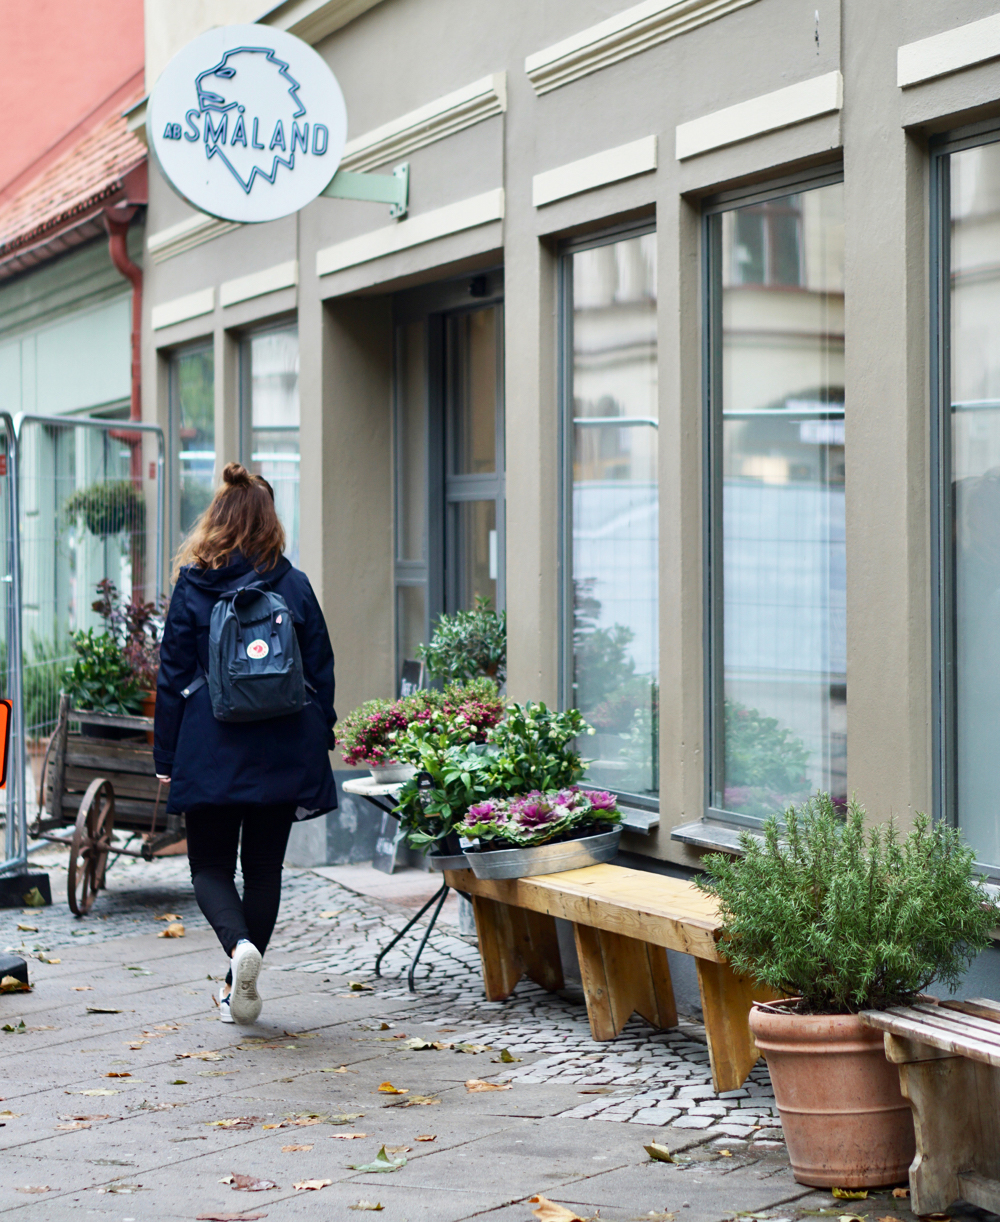 AB SMÅLAND Malmö